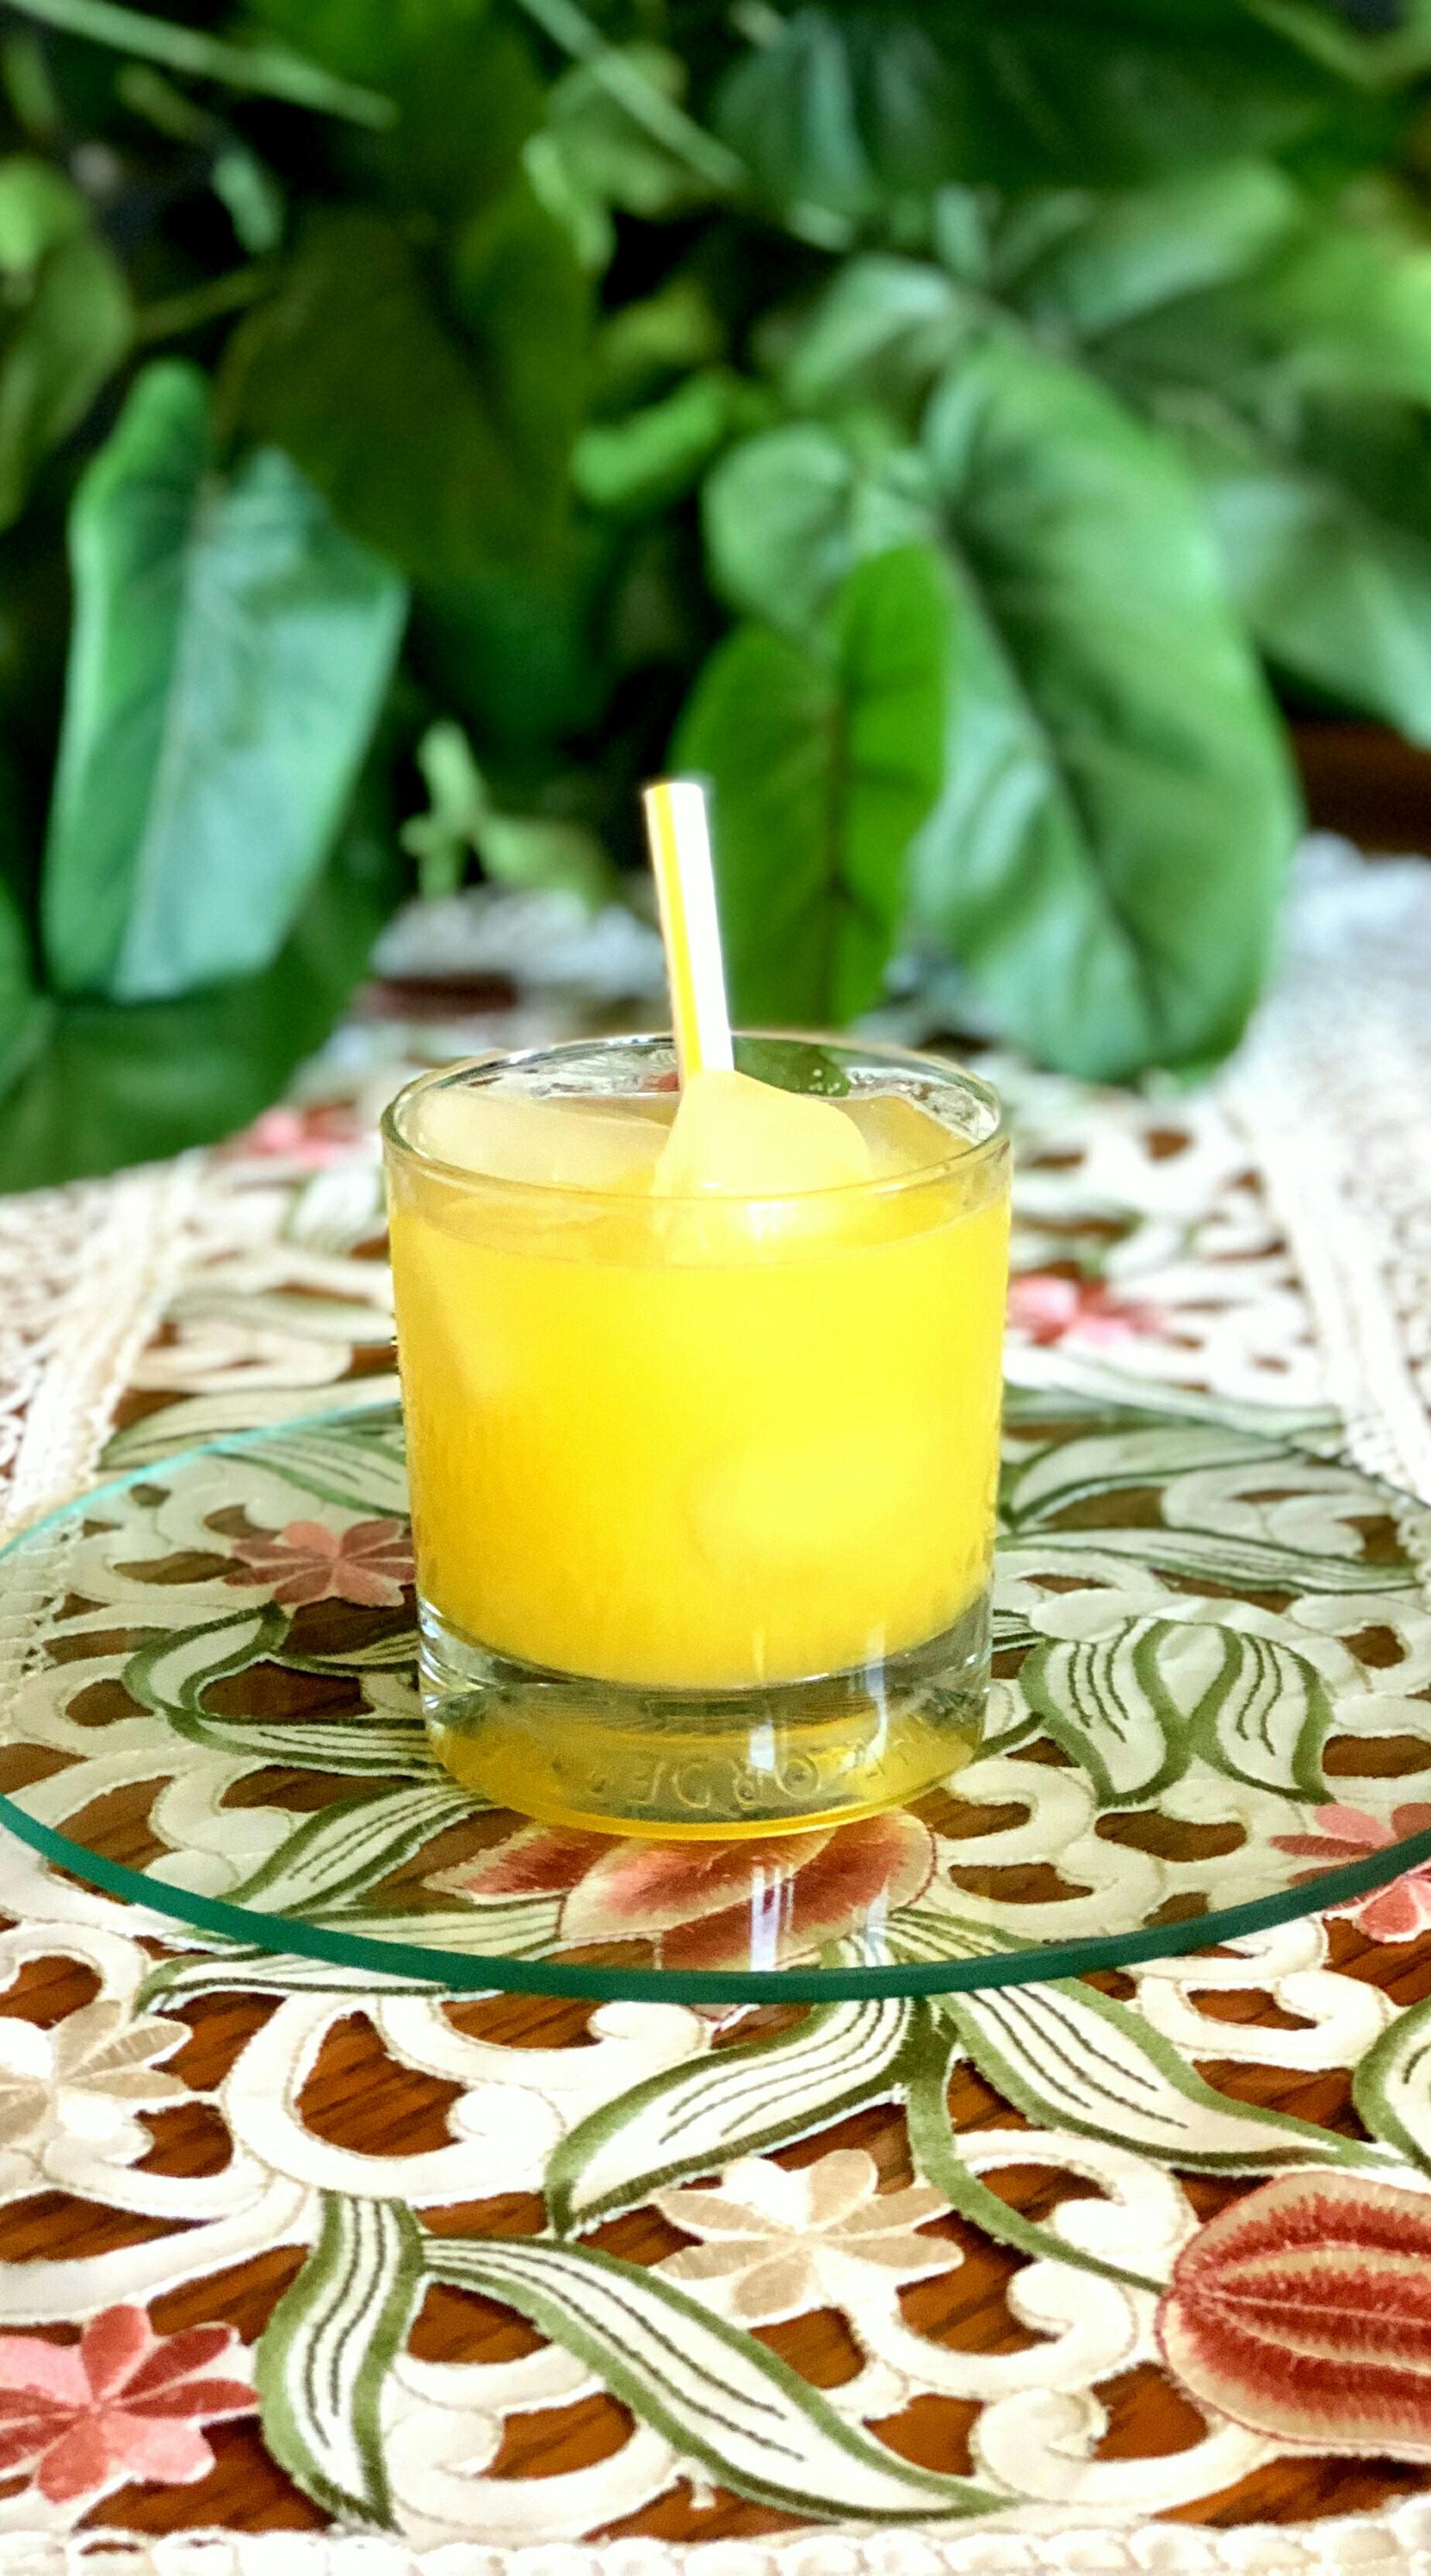 Shower Citrus Punch 2-2-2-2-2 image